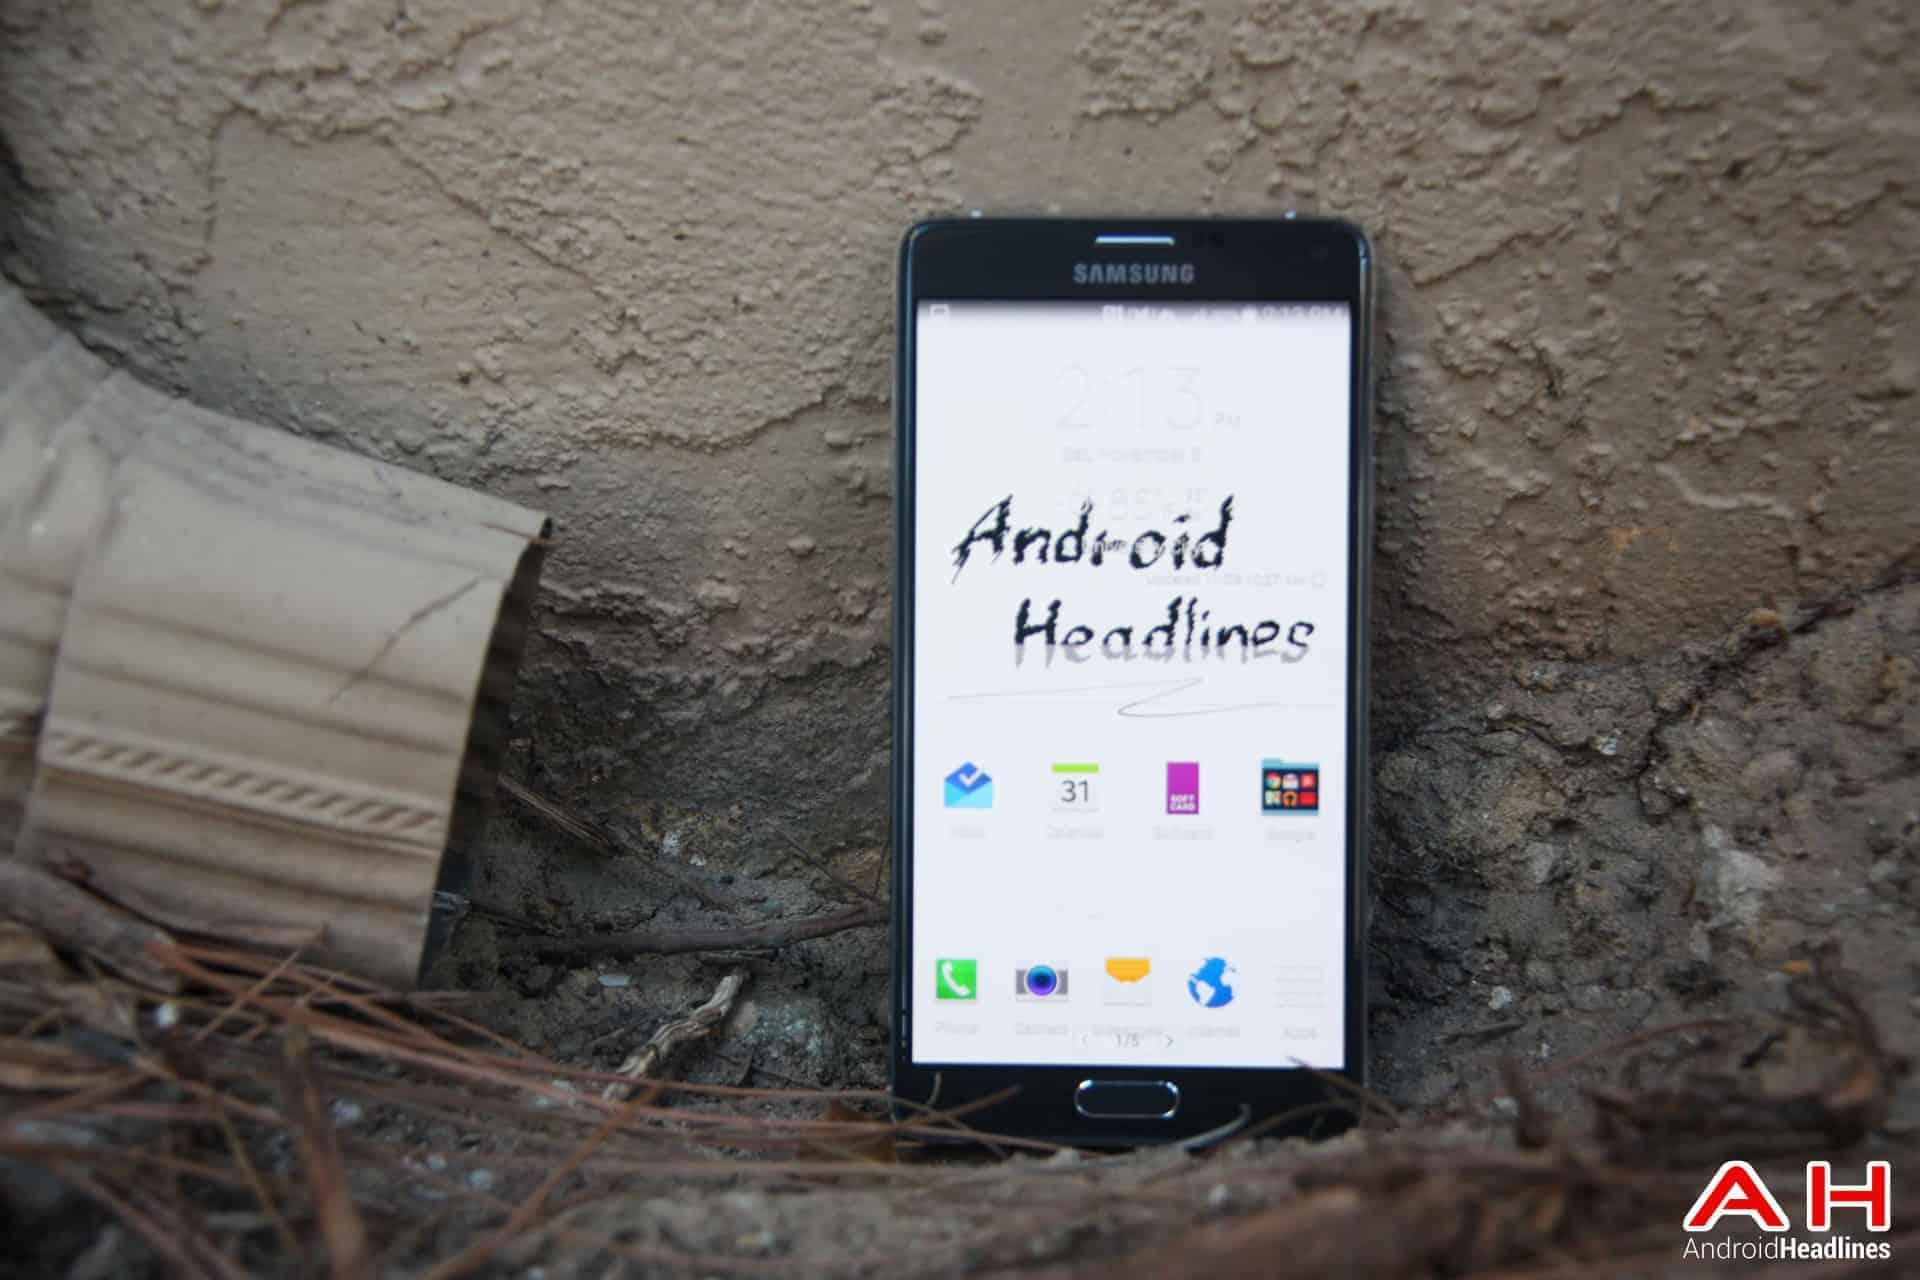 AH Samsung Galaxy Note 4 -1